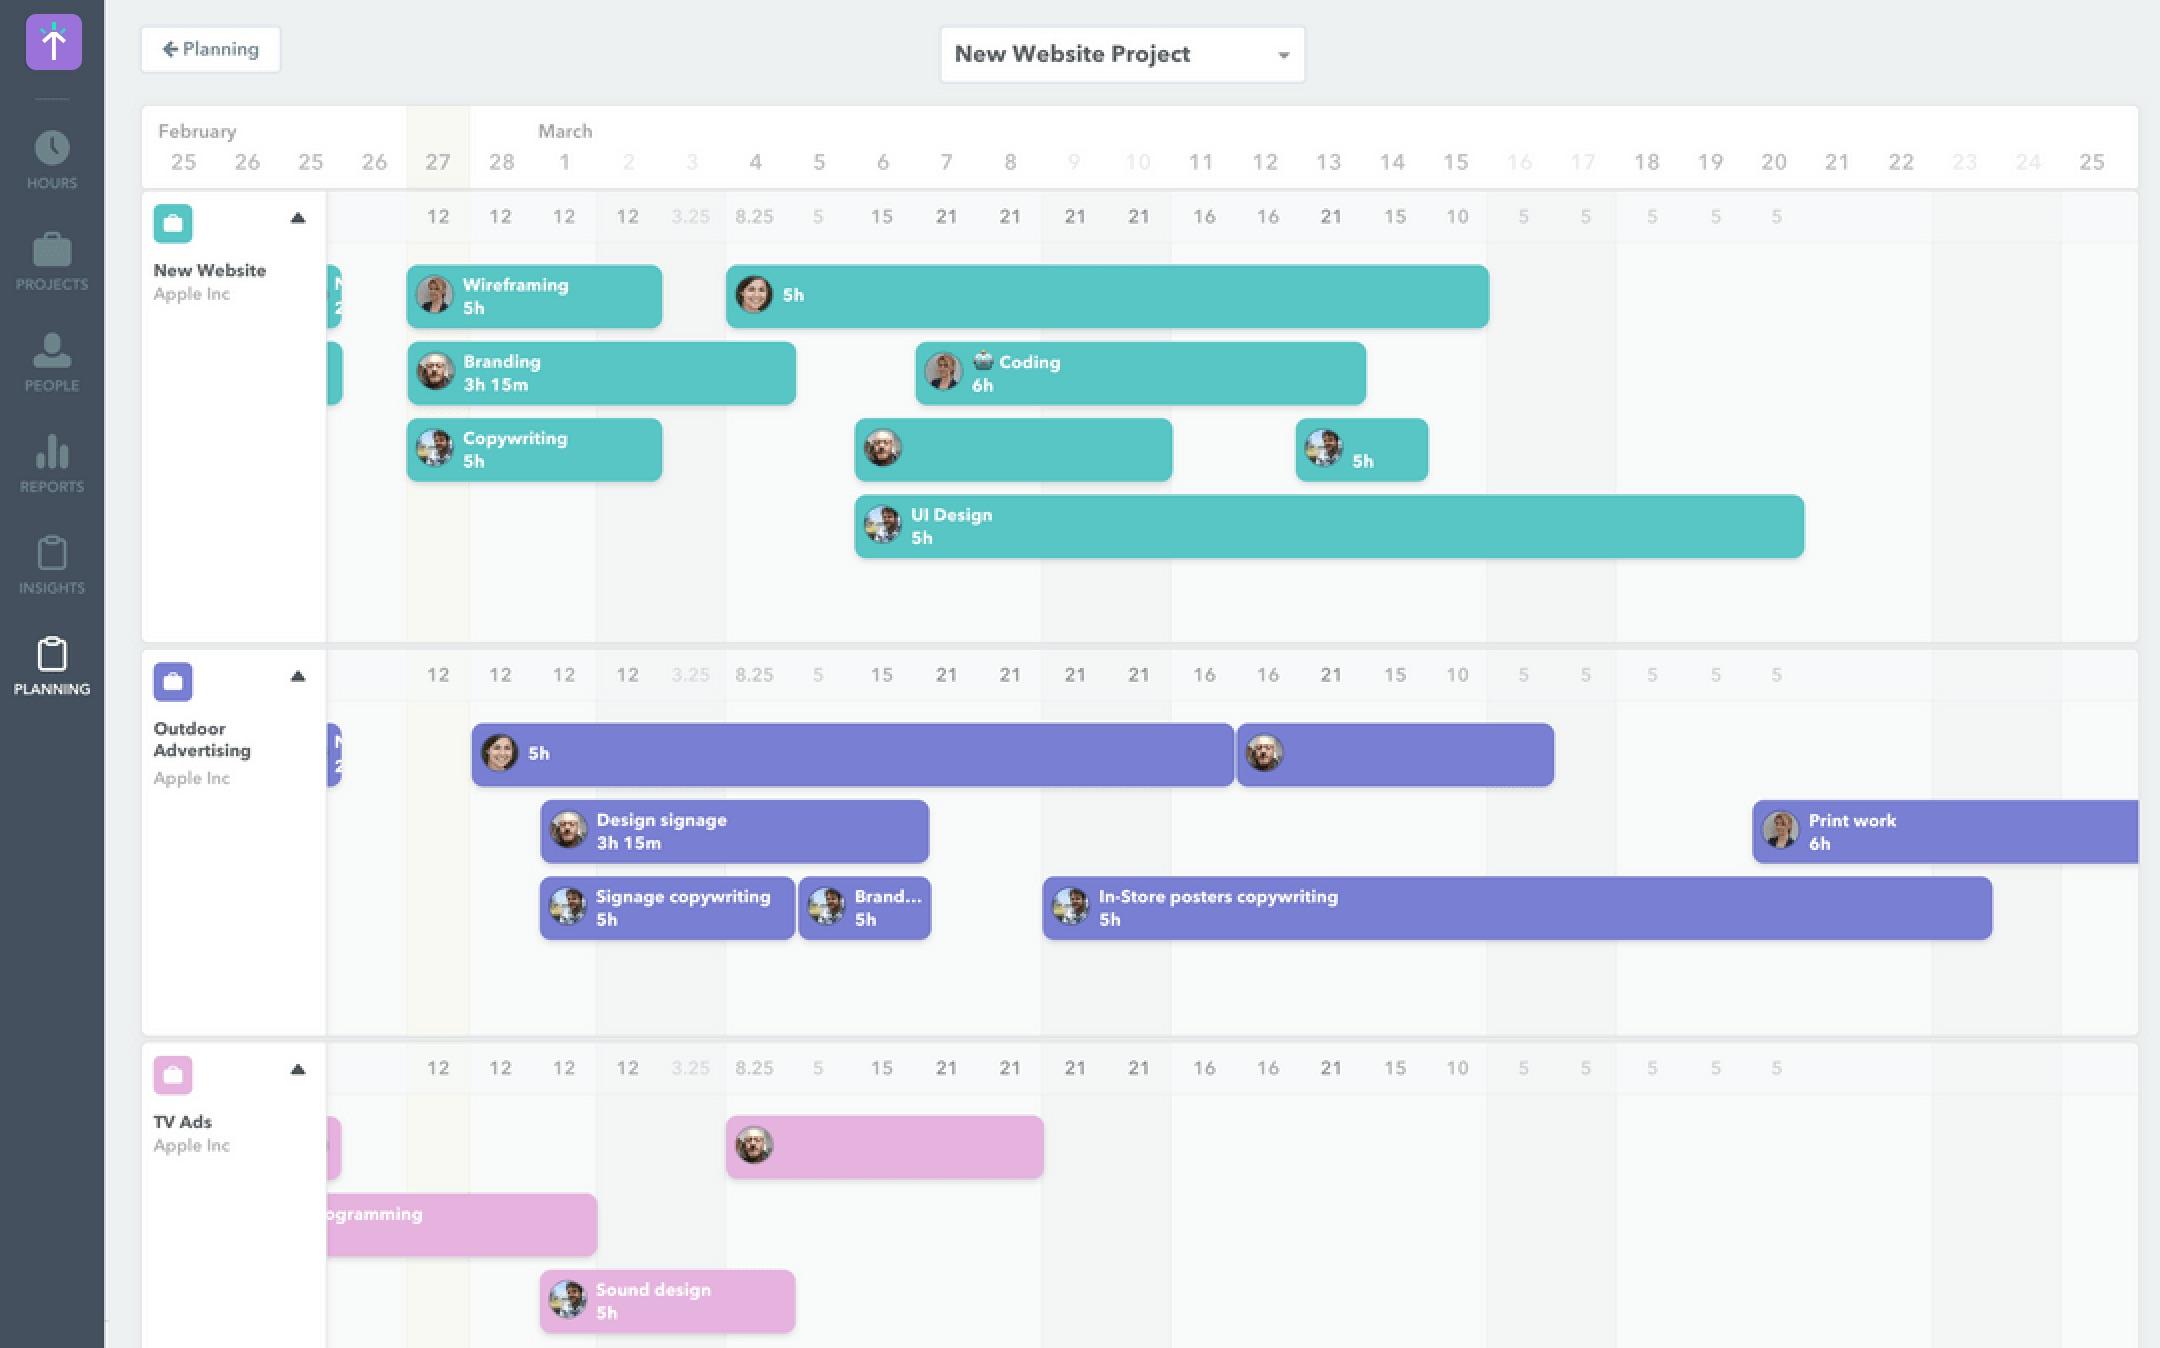 planning-tool@2x